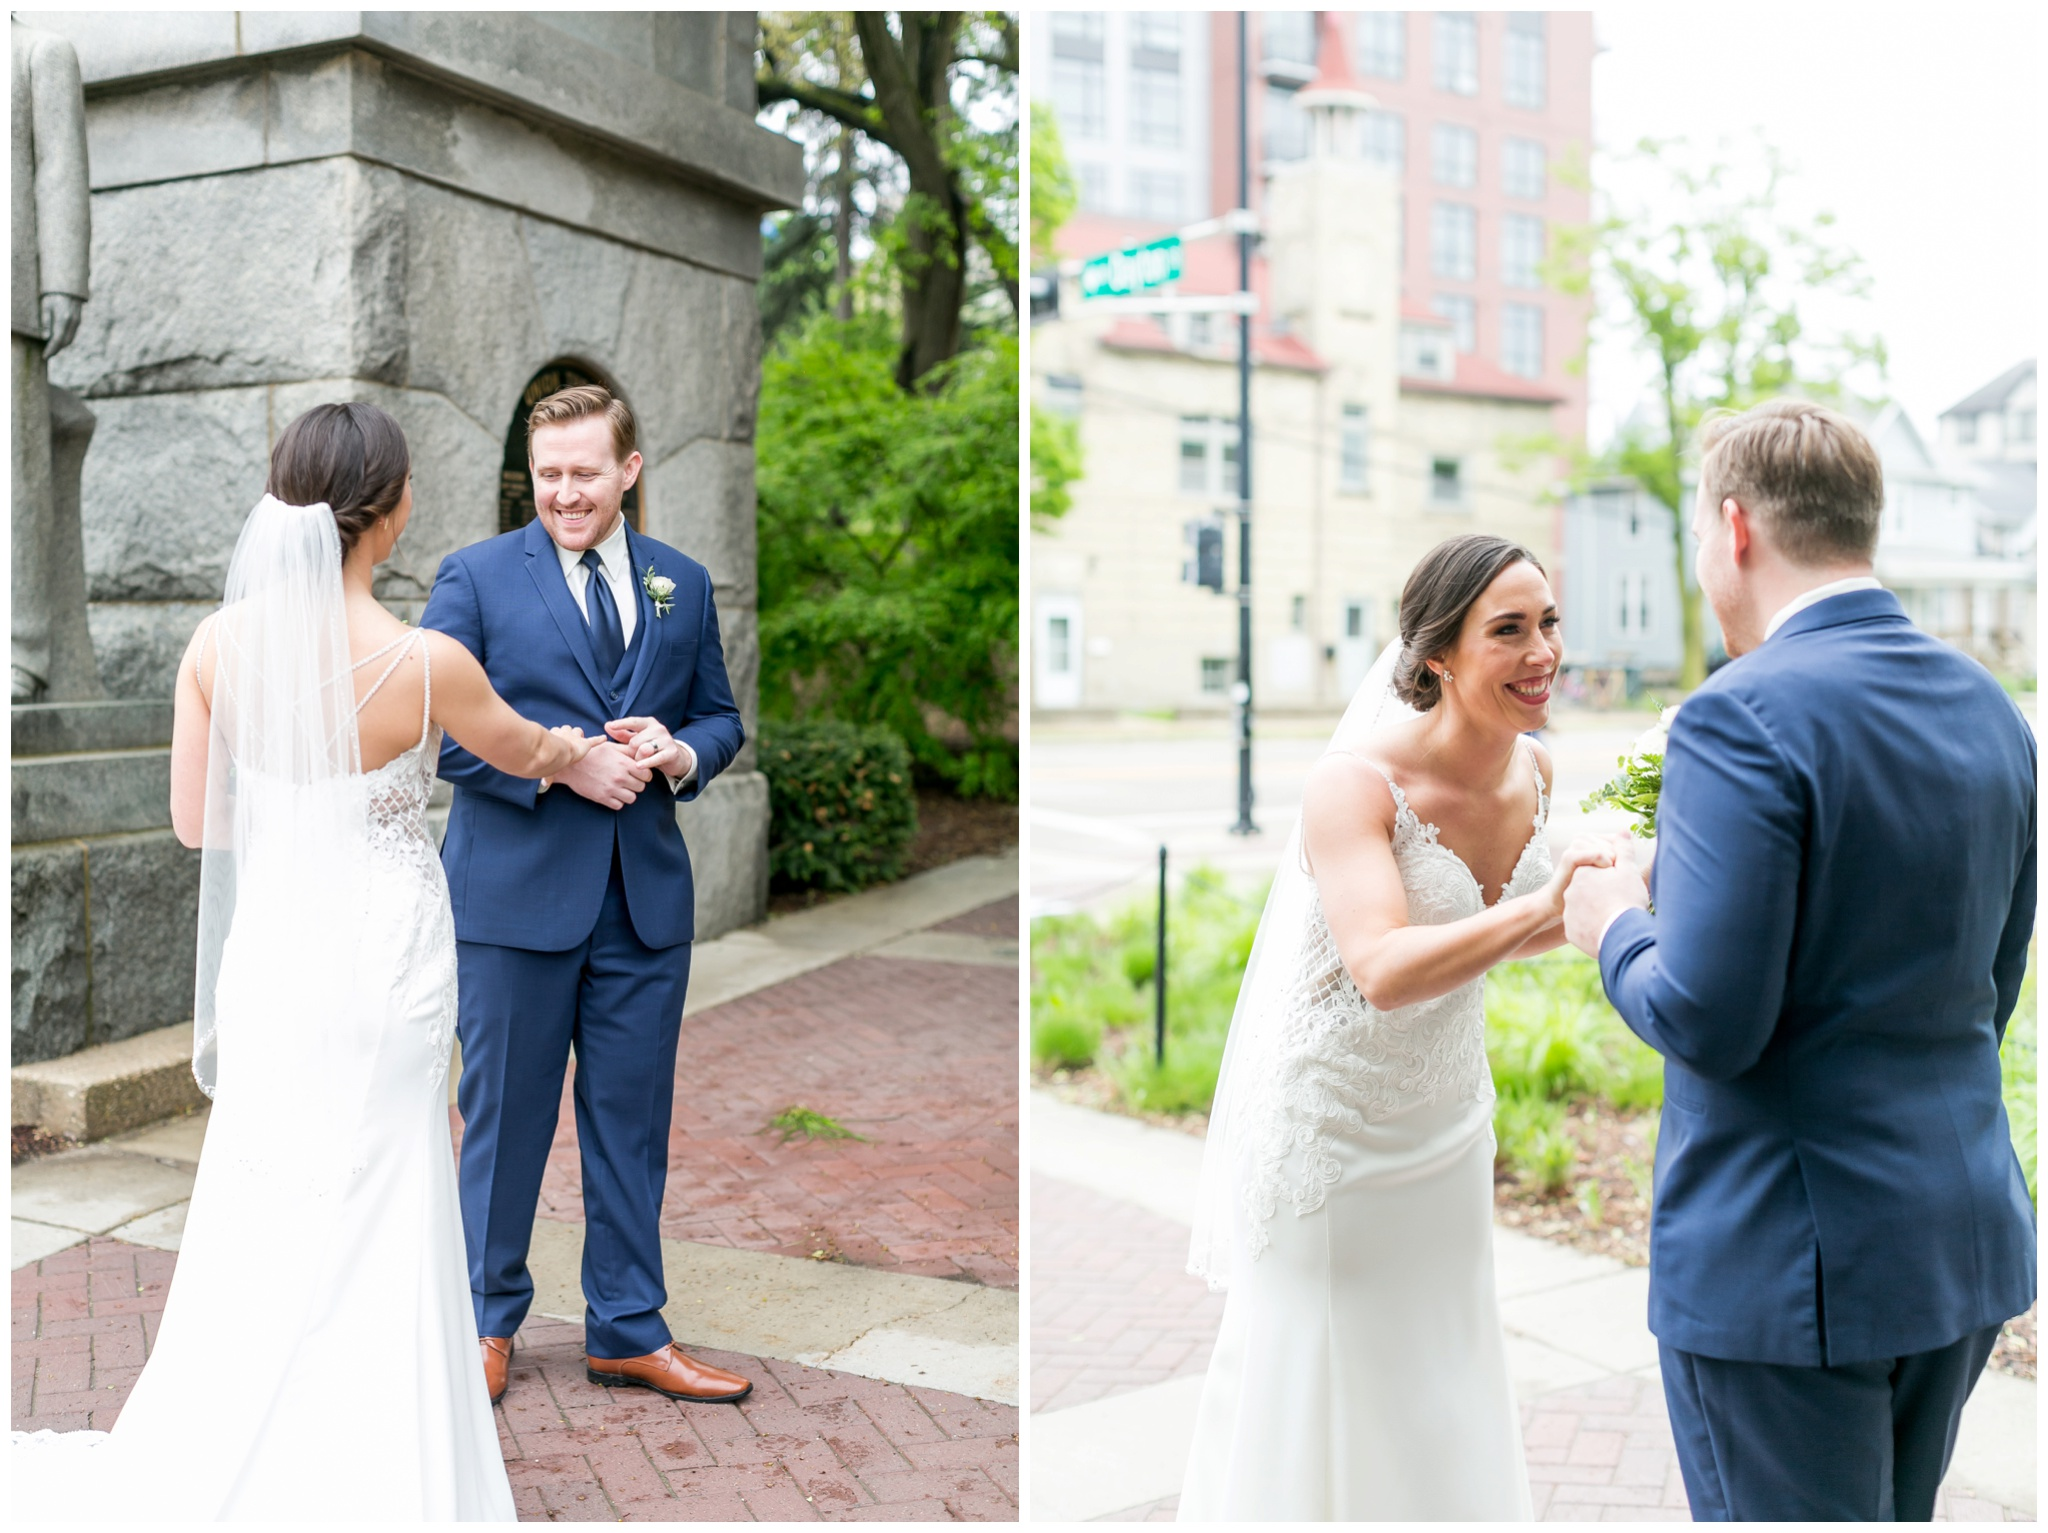 Union_south_Wedding_Madison_Wisconsin_Caynay_Photo_3630.jpg